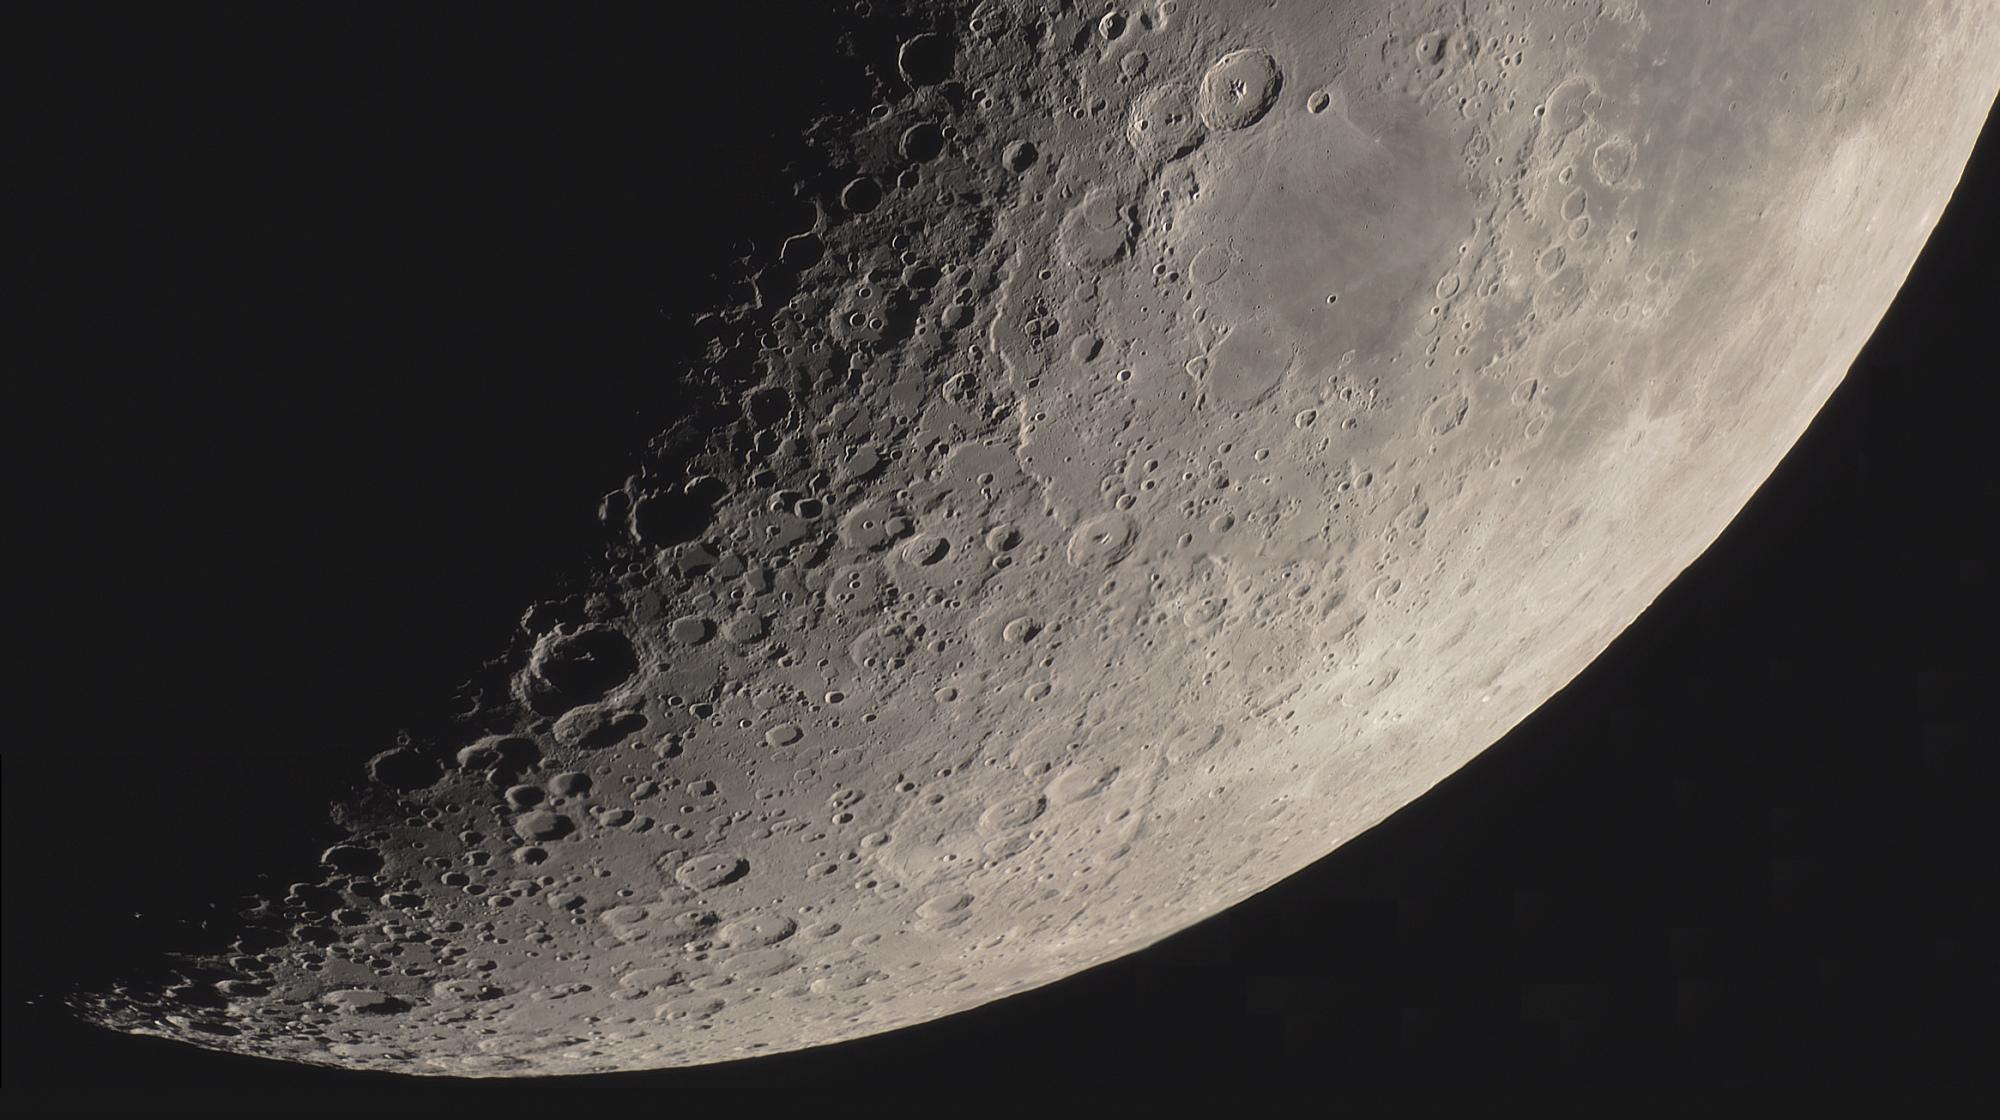 5e8759d89c1b9_lune(40)b.thumb.jpg.f5a3c6676776d686112b89204a994e52.jpg